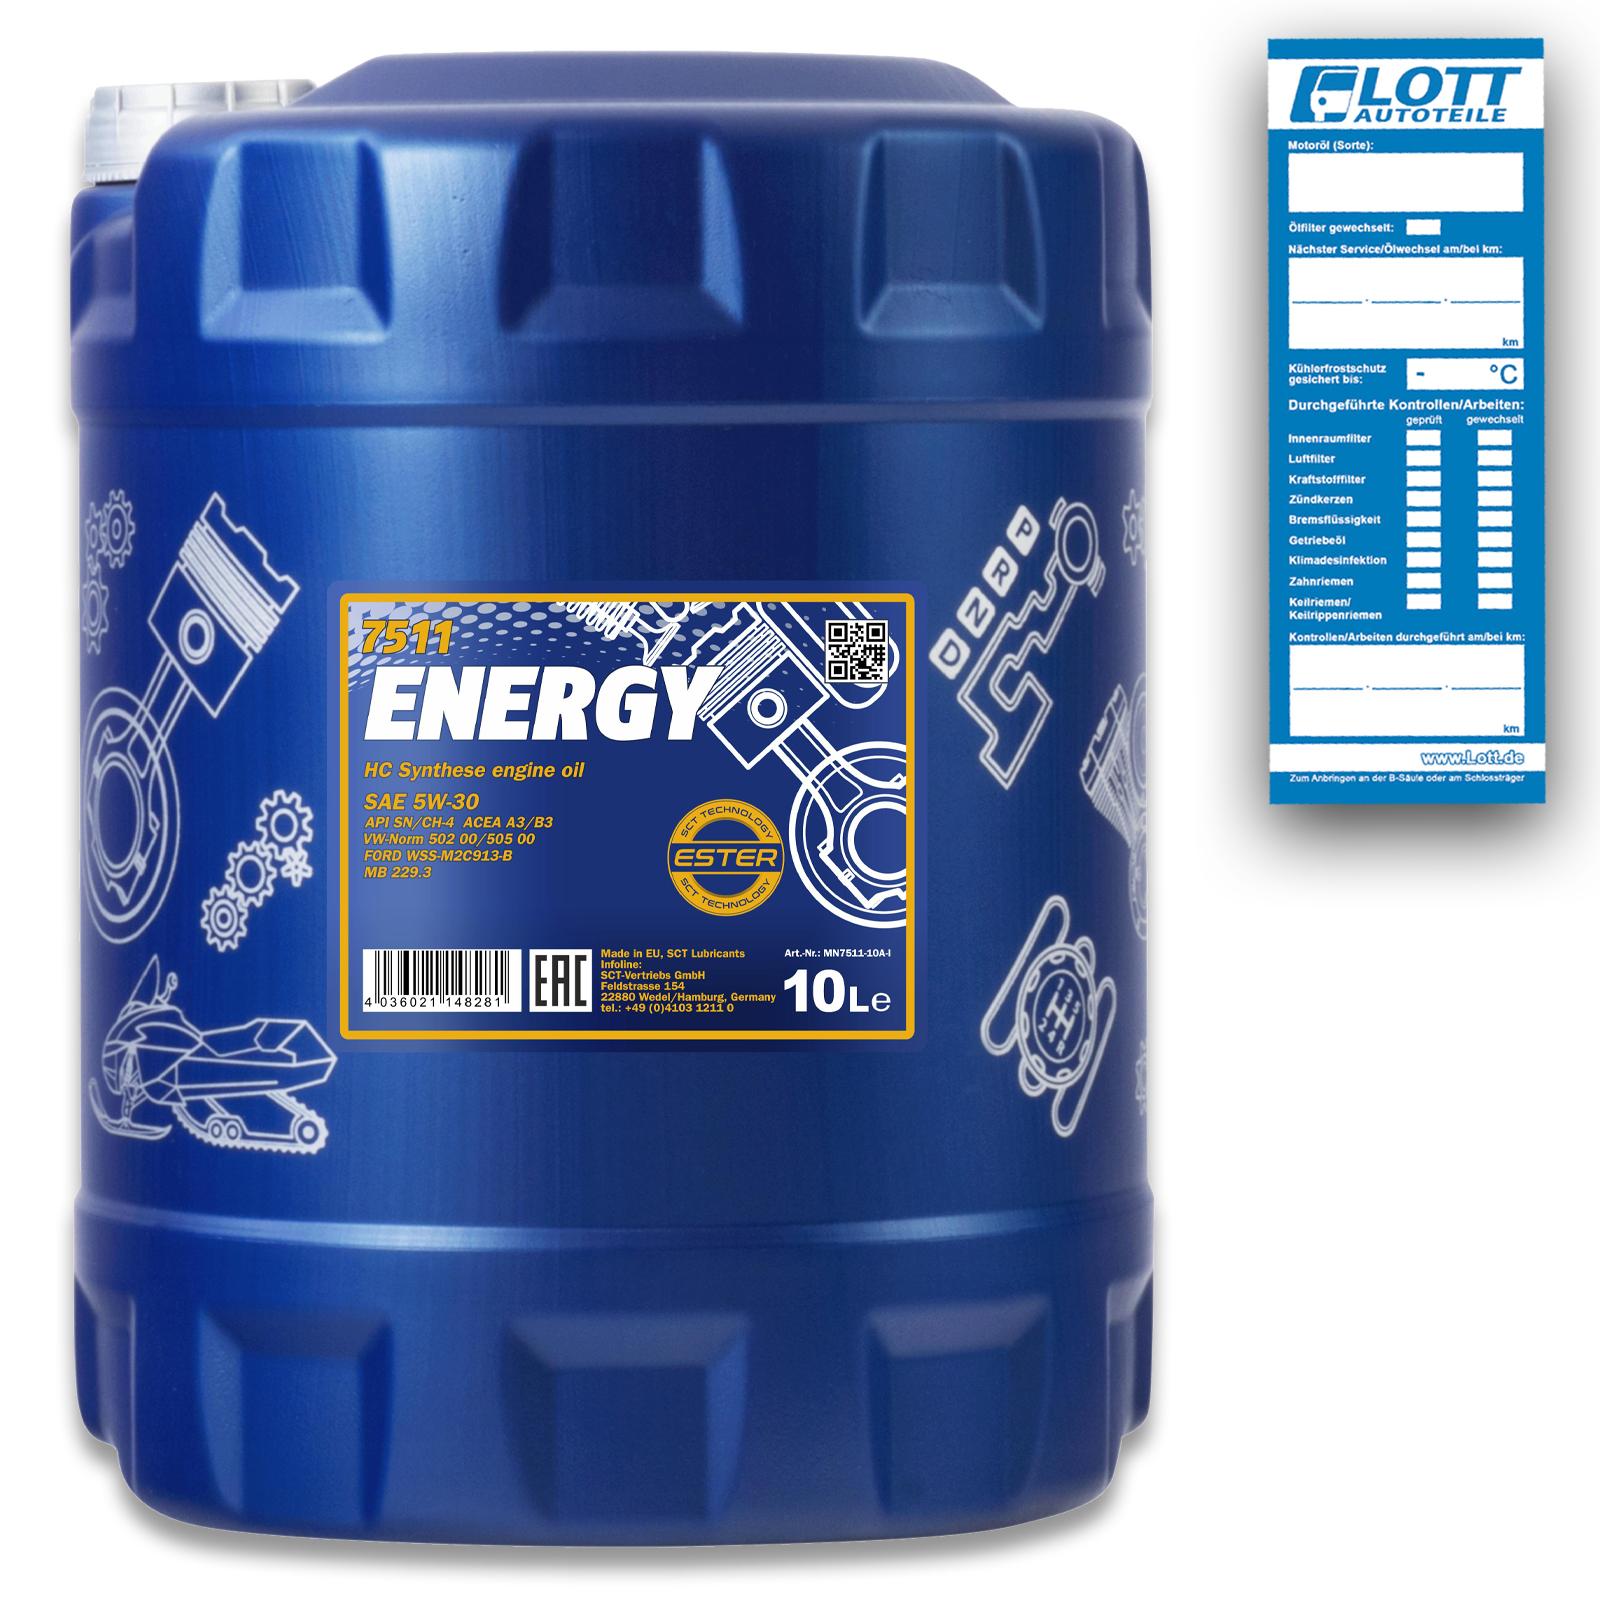 Mannol Energy 5W-30 Motoröl 10L